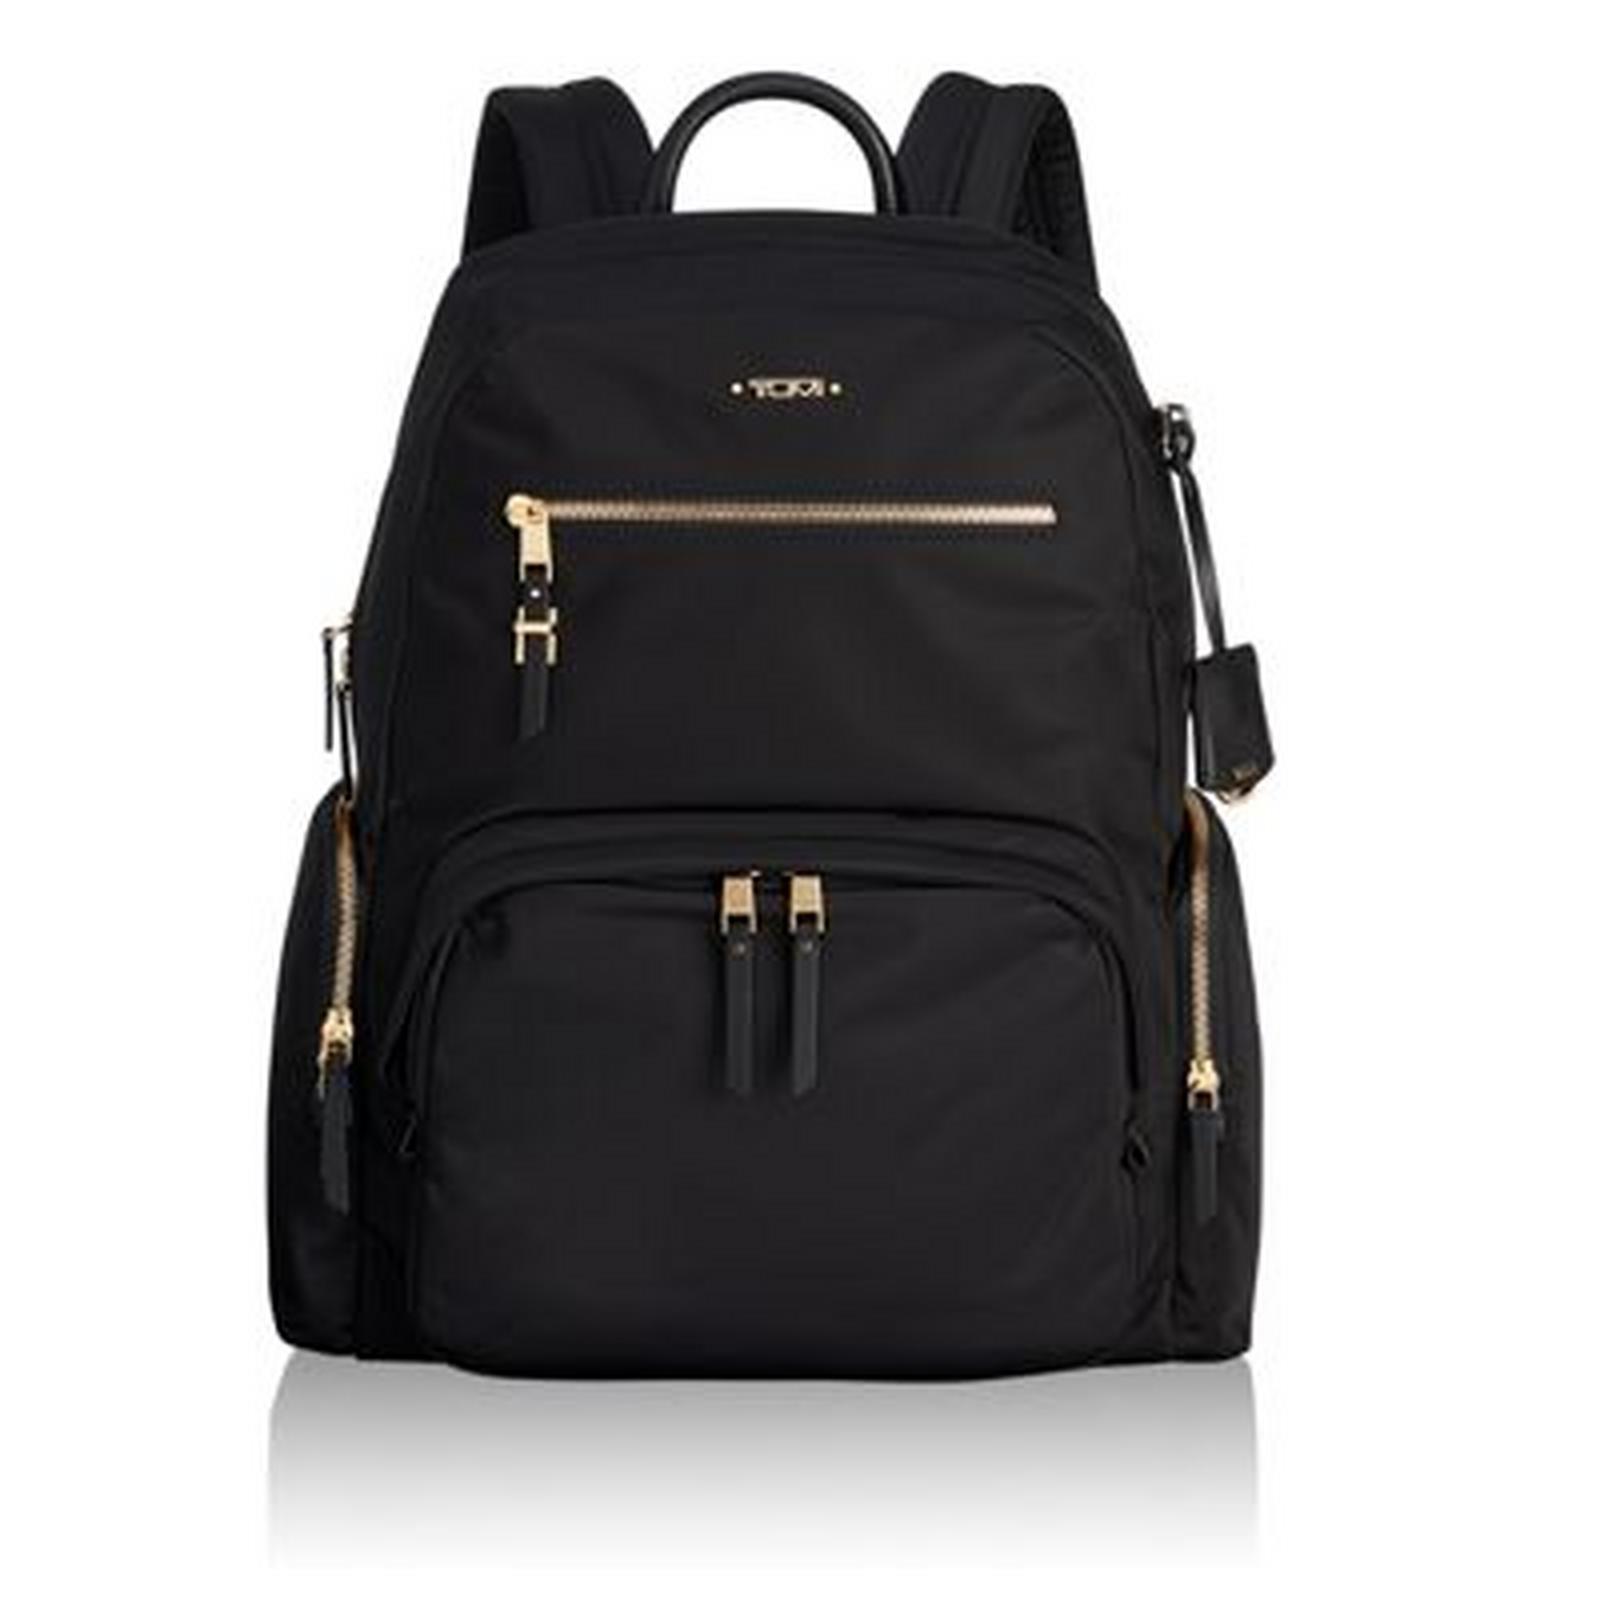 7638a051f93e86 Carson Backpack - Voyageur - Tumi United States - Black